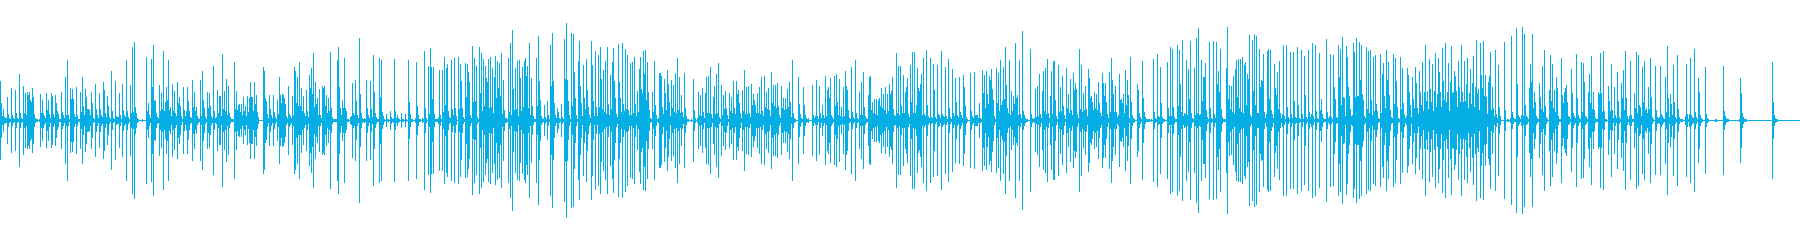 三味線139越後獅子3新潟県月潟角兵衛獅の再生済みの波形